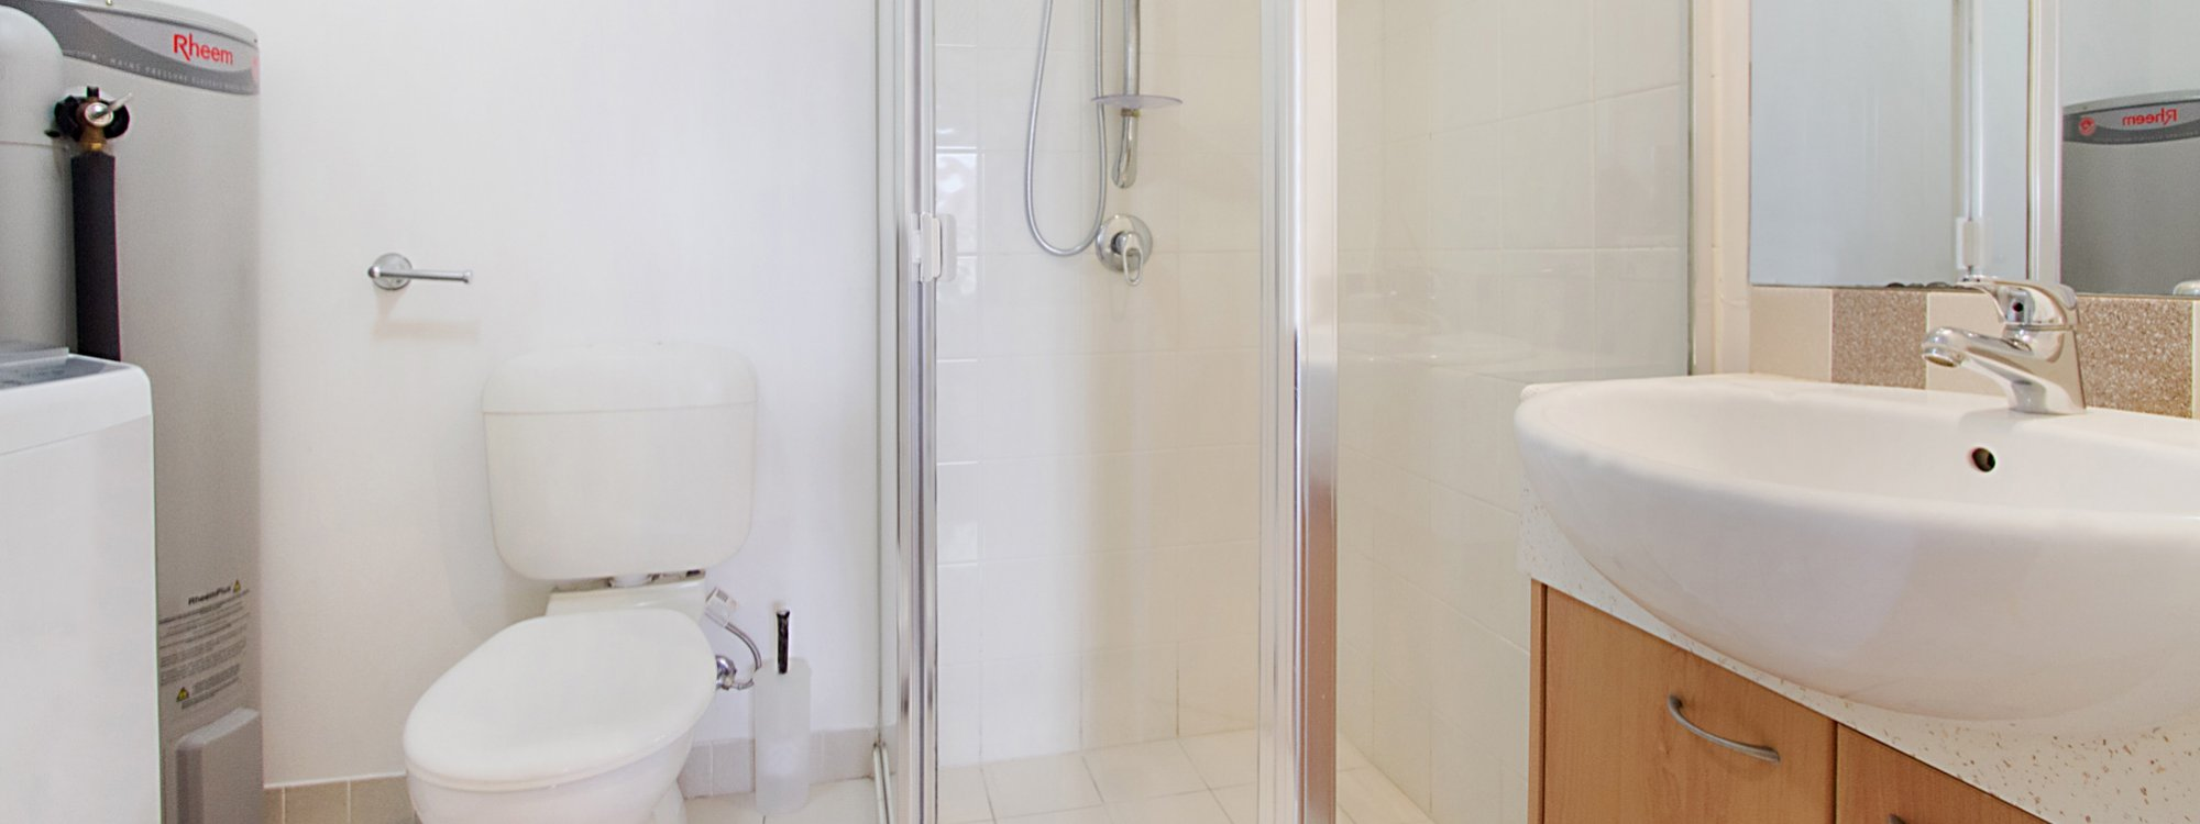 Sunset In Surfers - Gold Coast - Bathroom 1